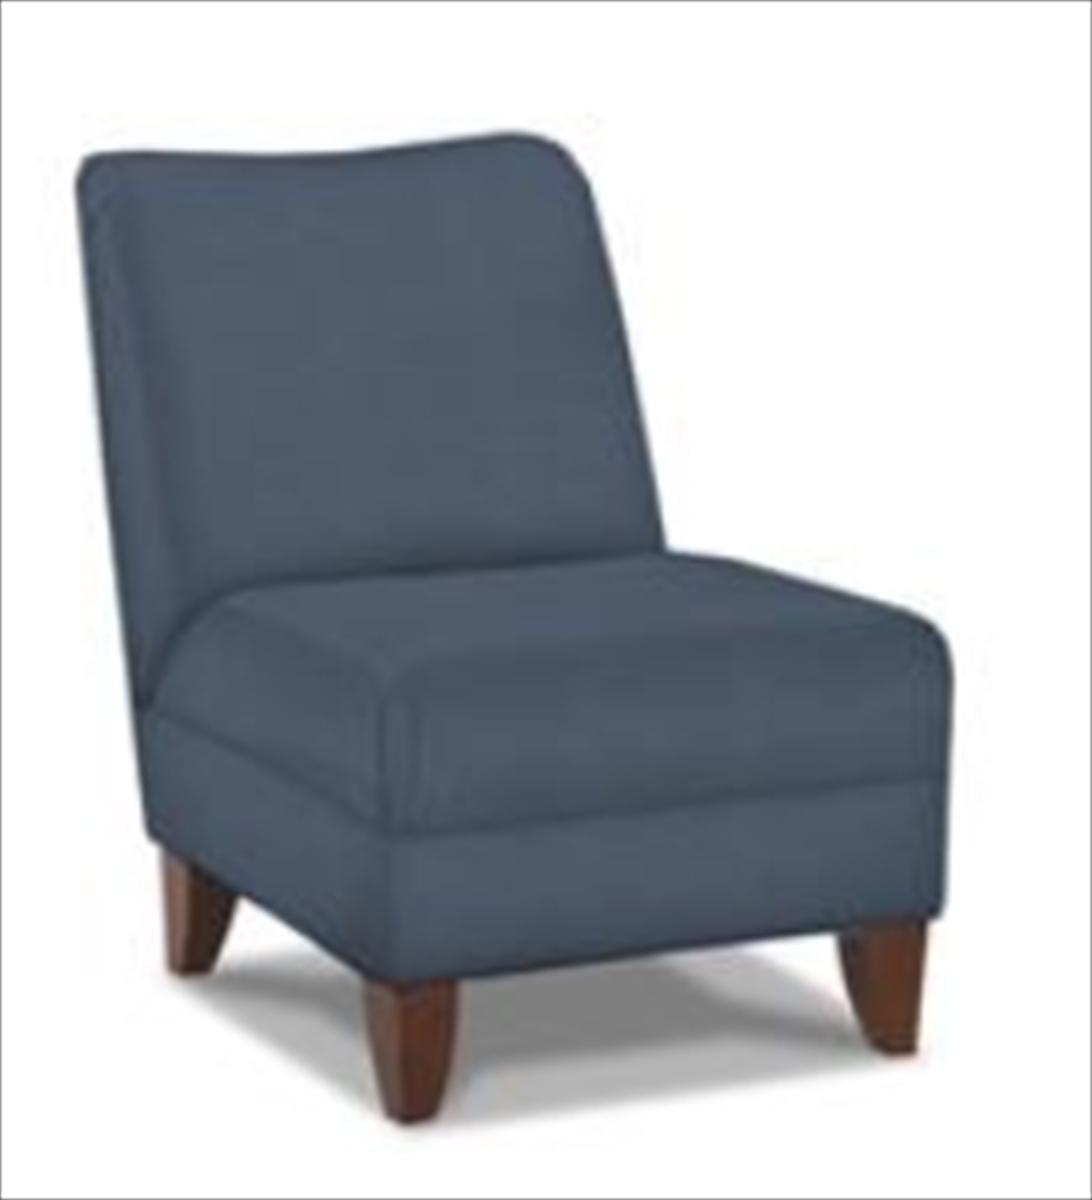 Klaussner Linus Armless Chair - Willow Bluestone